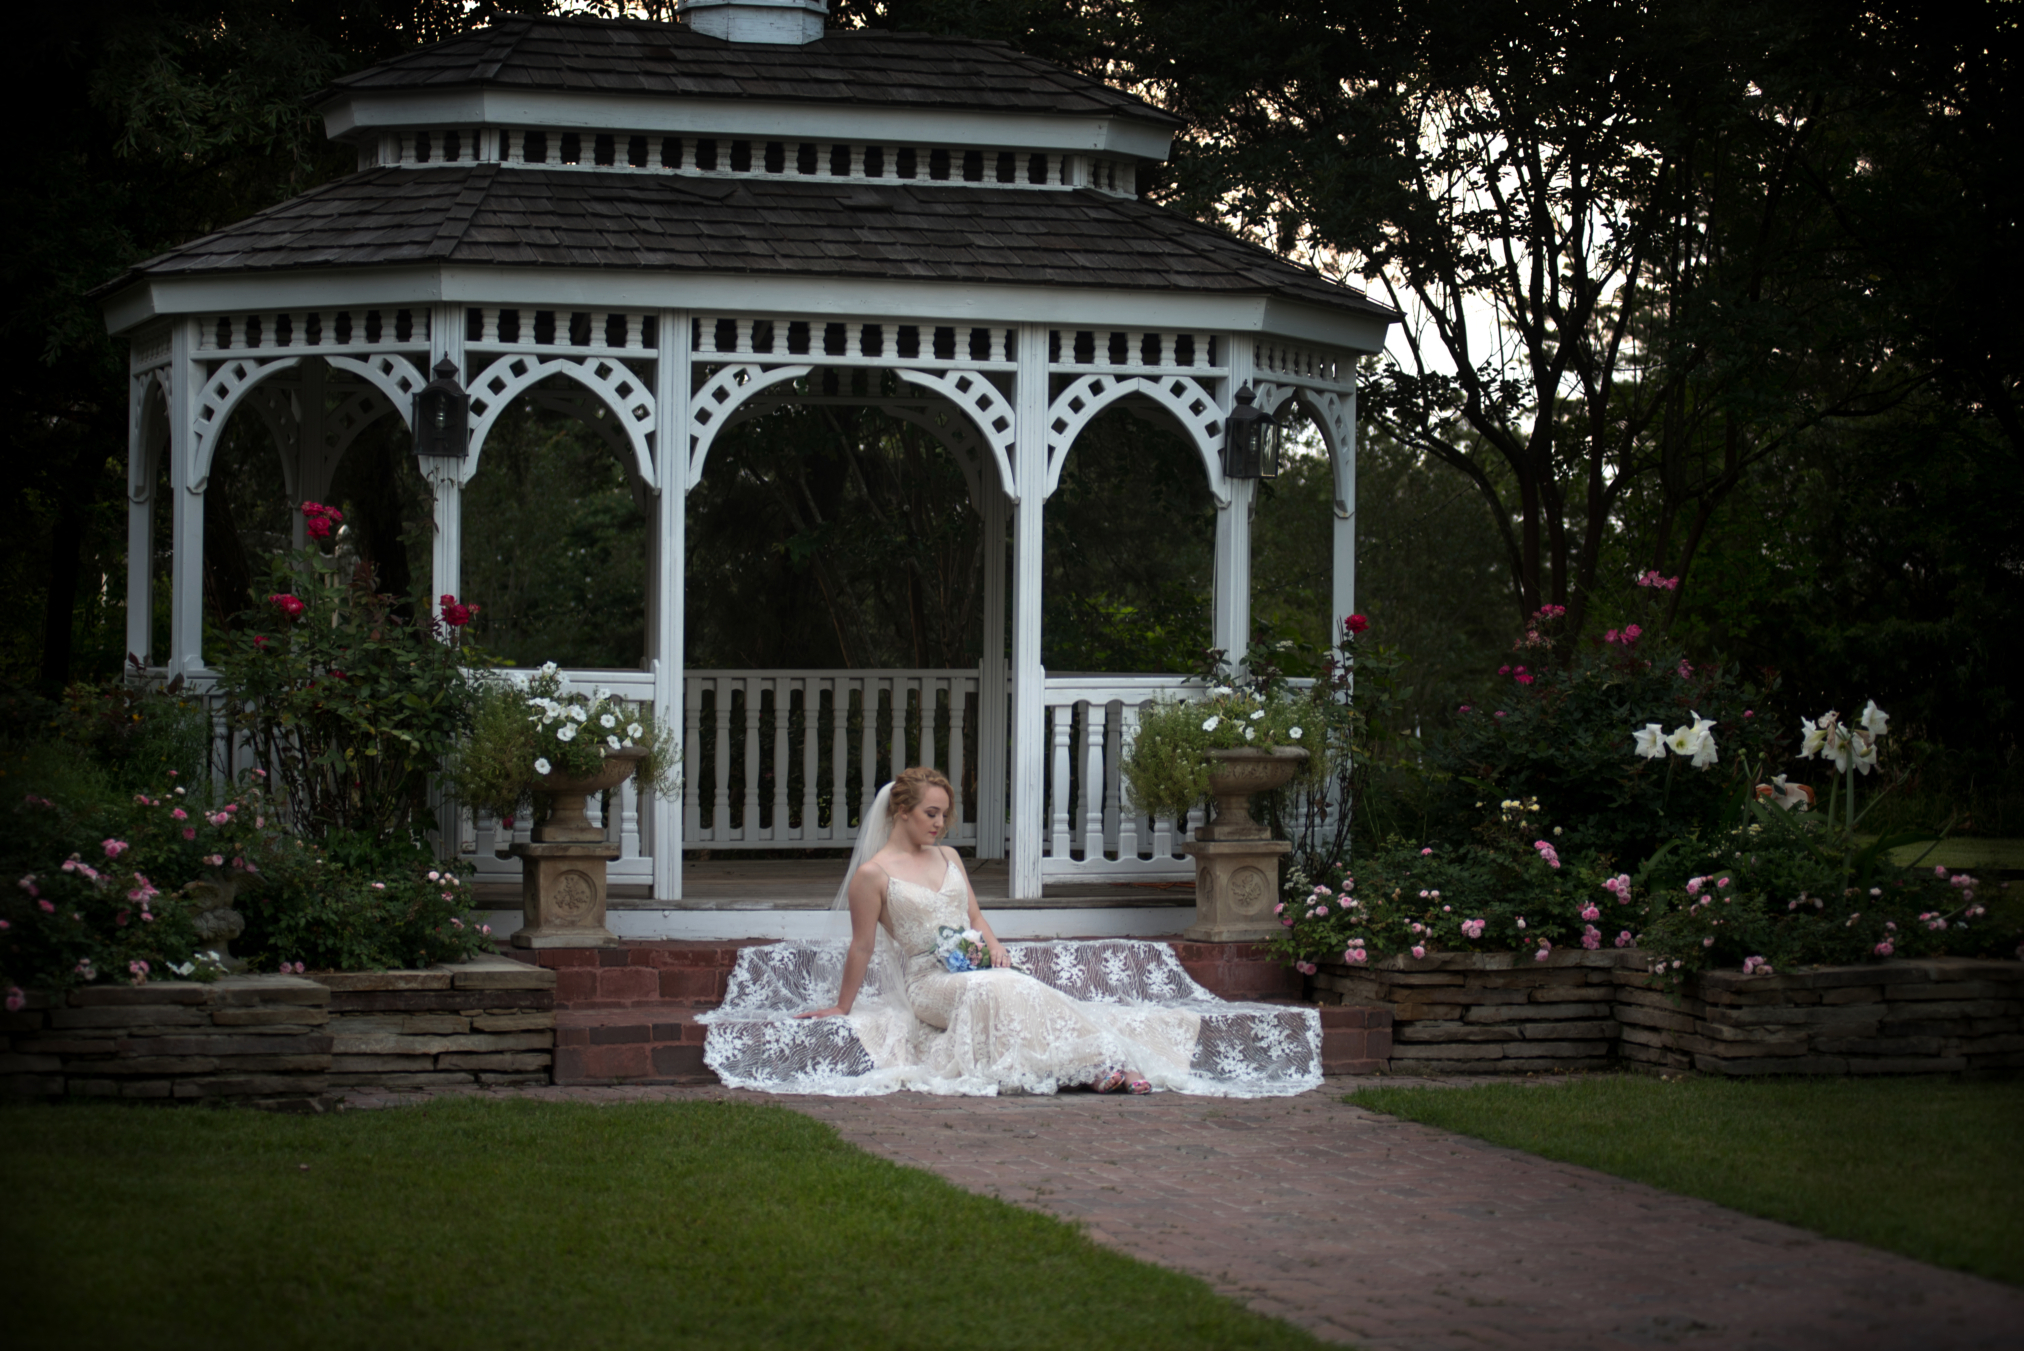 Portrait of a bride sitting on the steps of a gazebo at dusk - Covid-19 Weddings